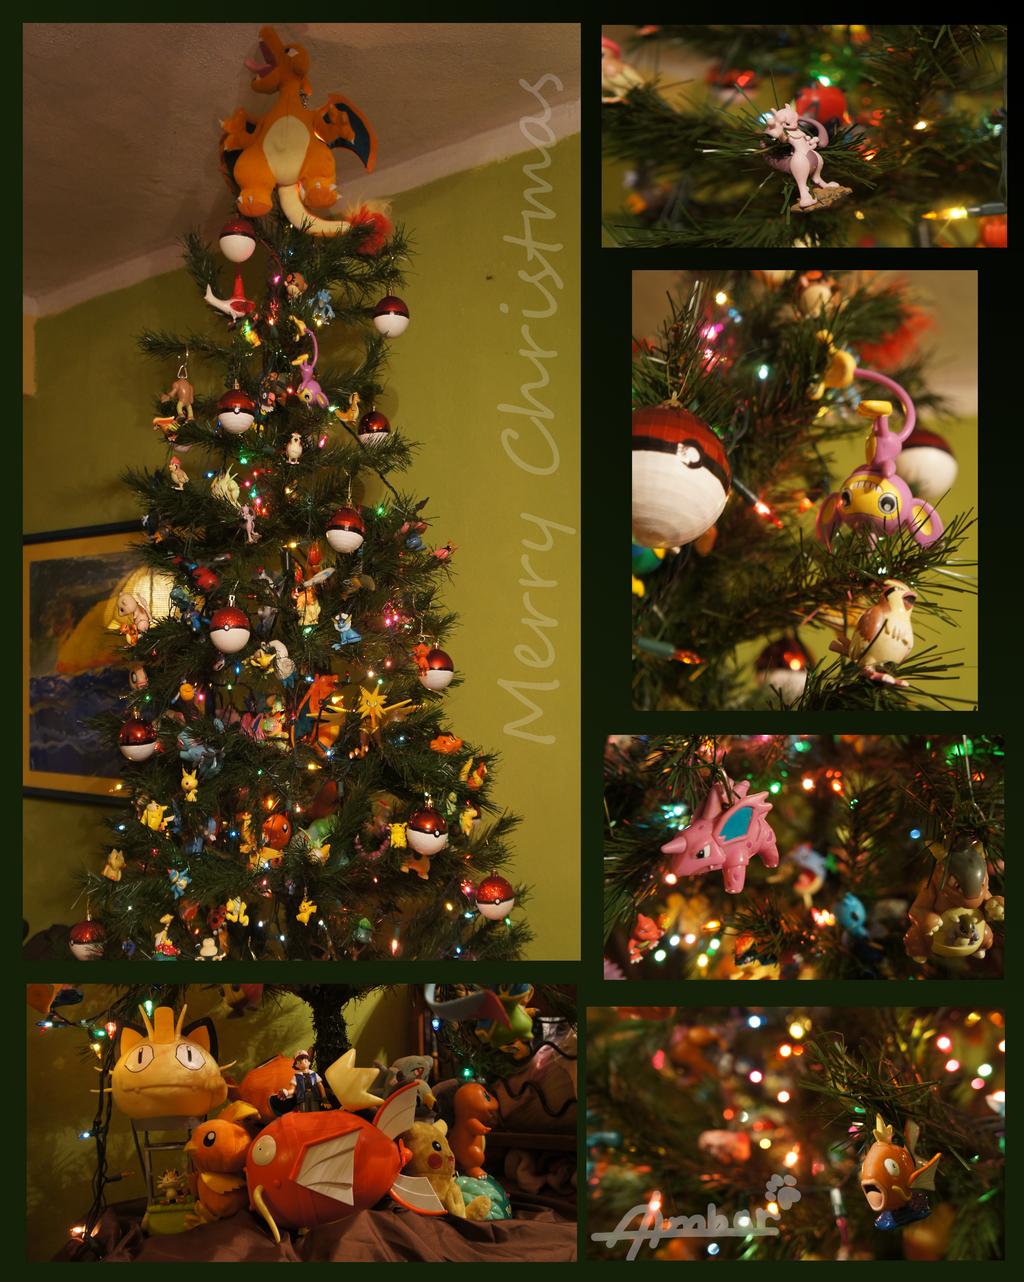 Pokemon christmas tree by dragonperro96 on DeviantArt